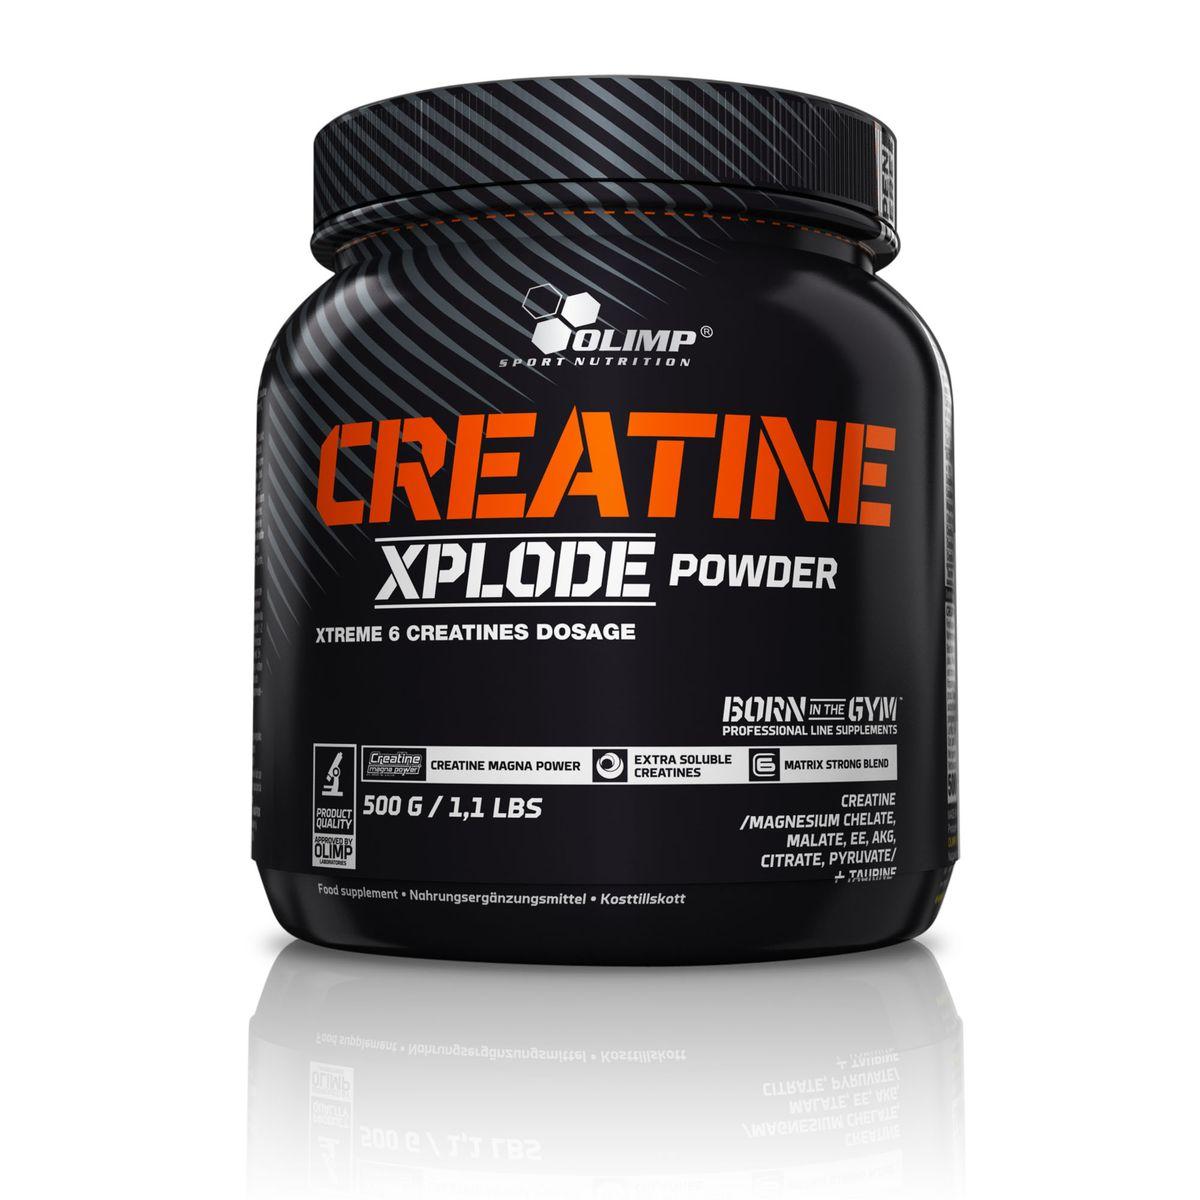 OLIMP Креатин Creatine Xplode Powder 500г ананас